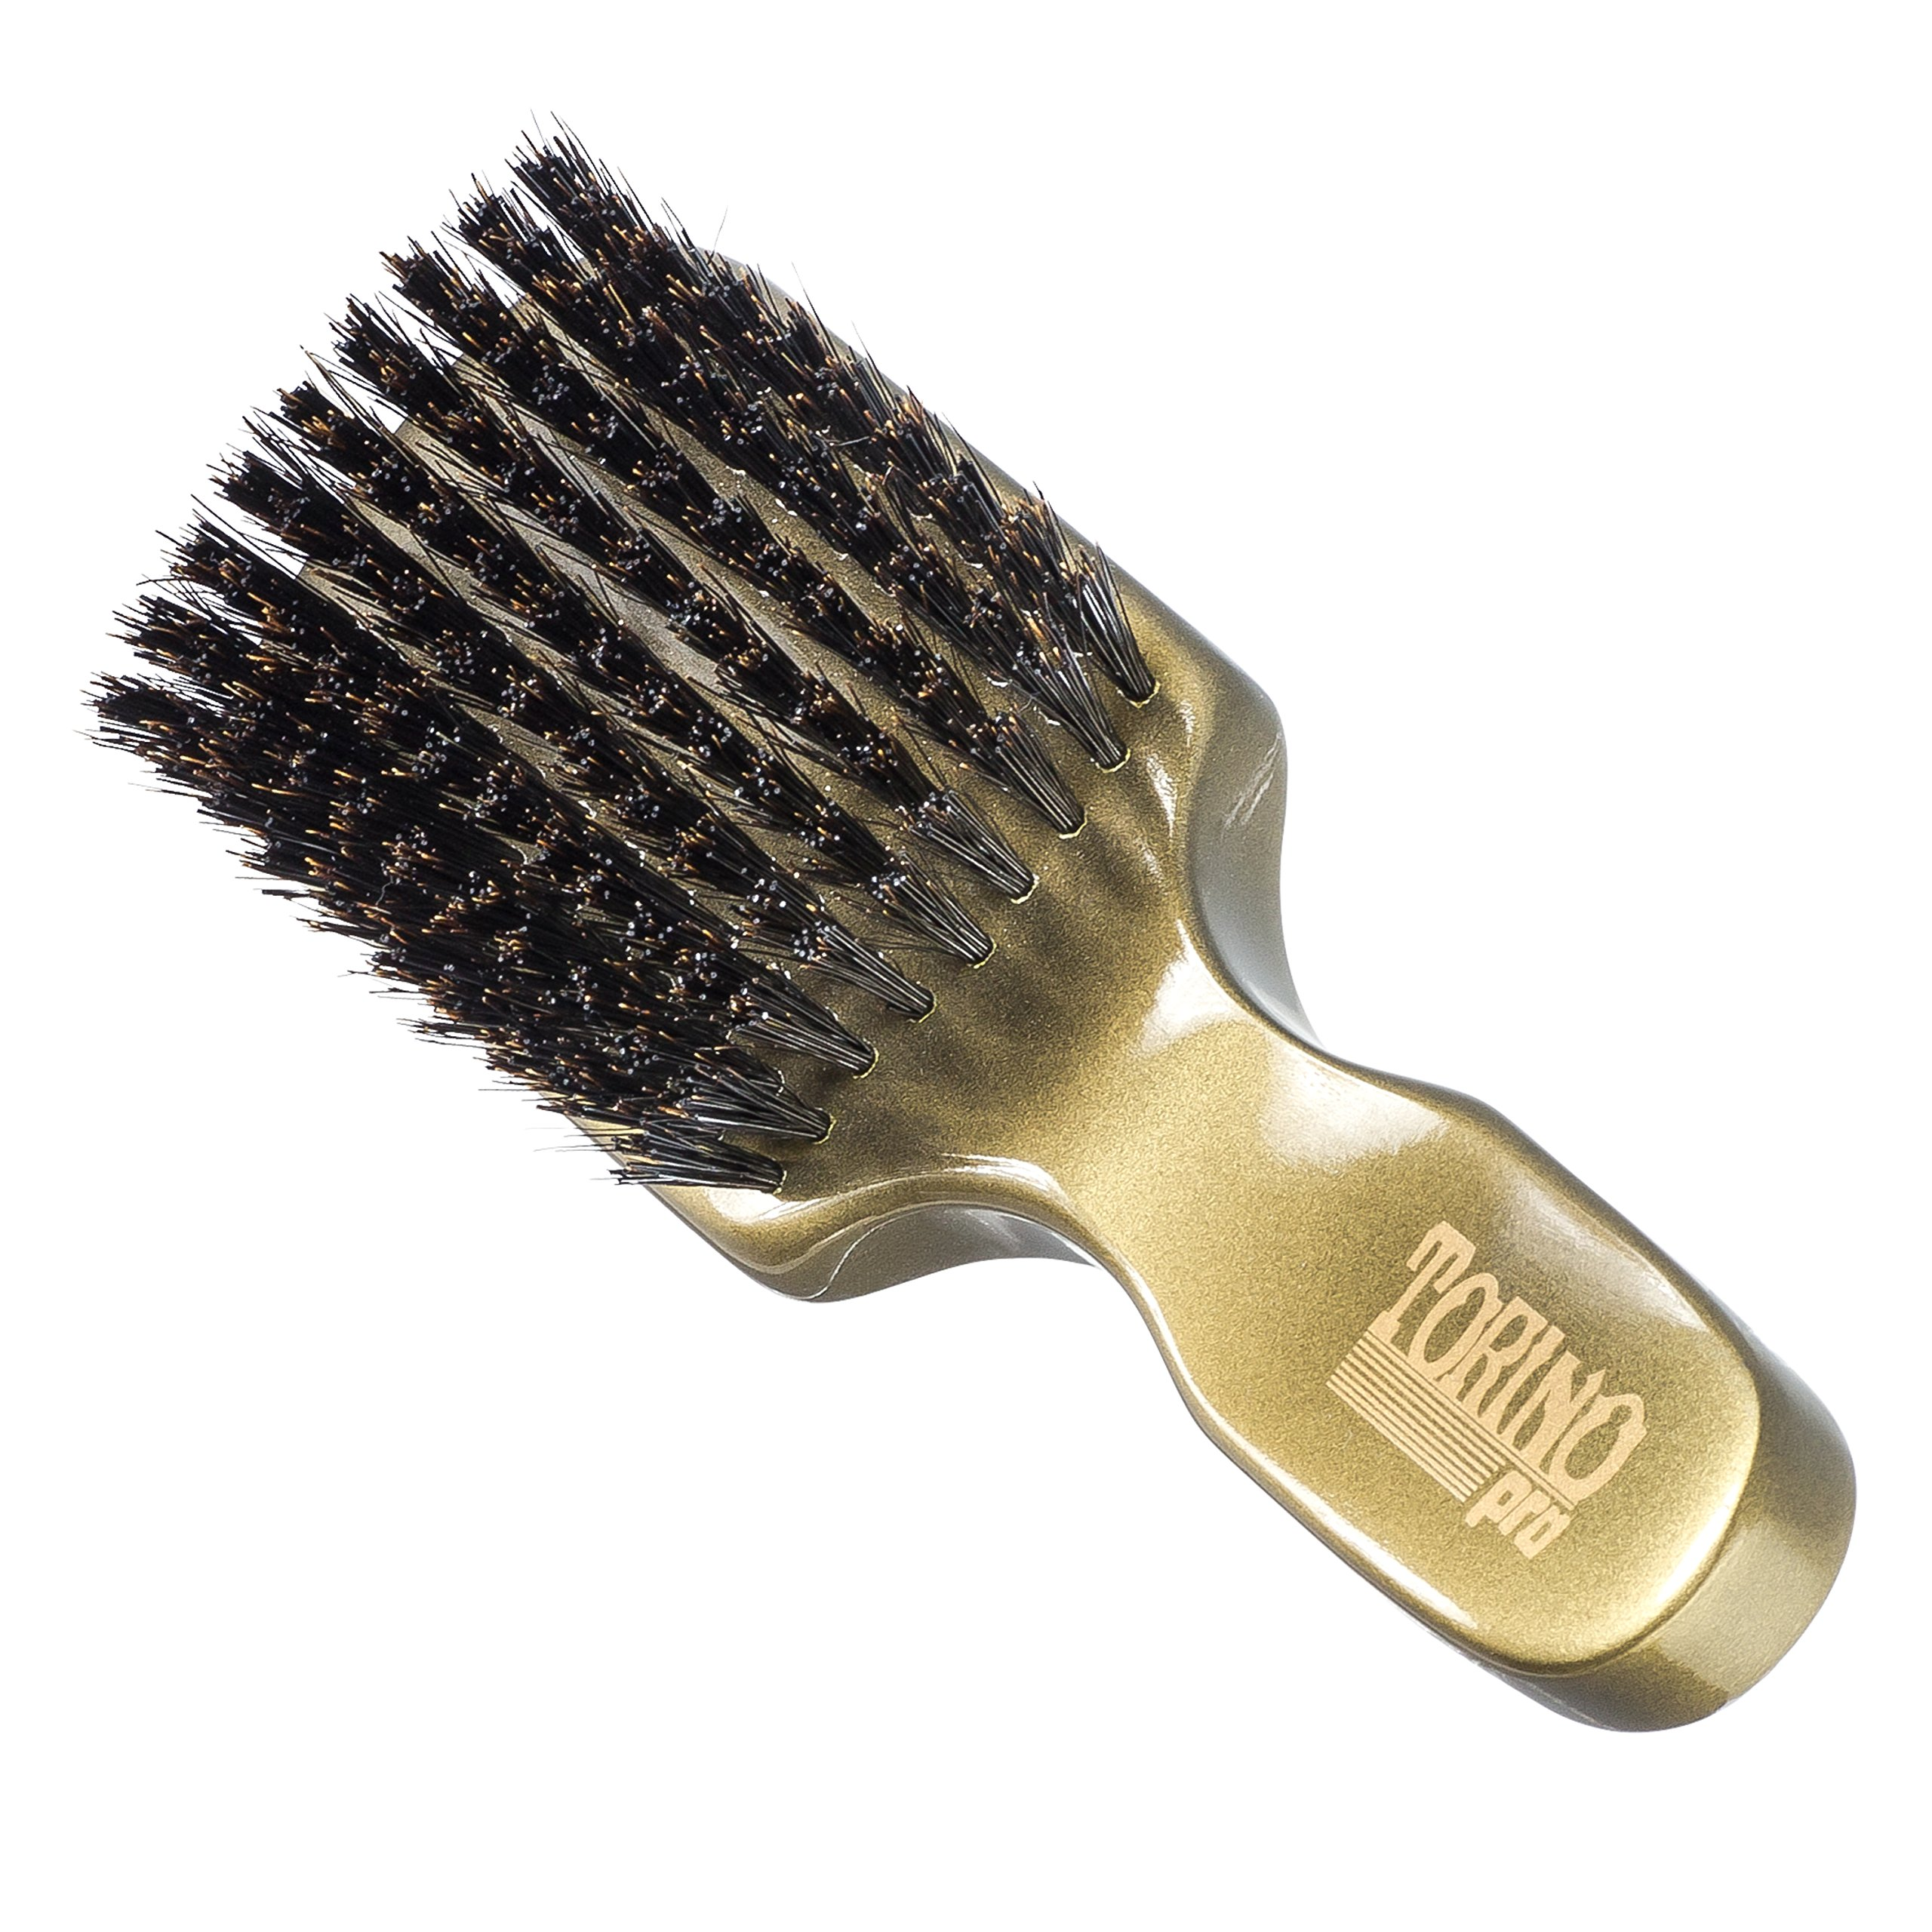 Torino Pro Wave Brush 890 By Brush King Medium Hard 360 Waves Club Brush Walmart Com Walmart Com